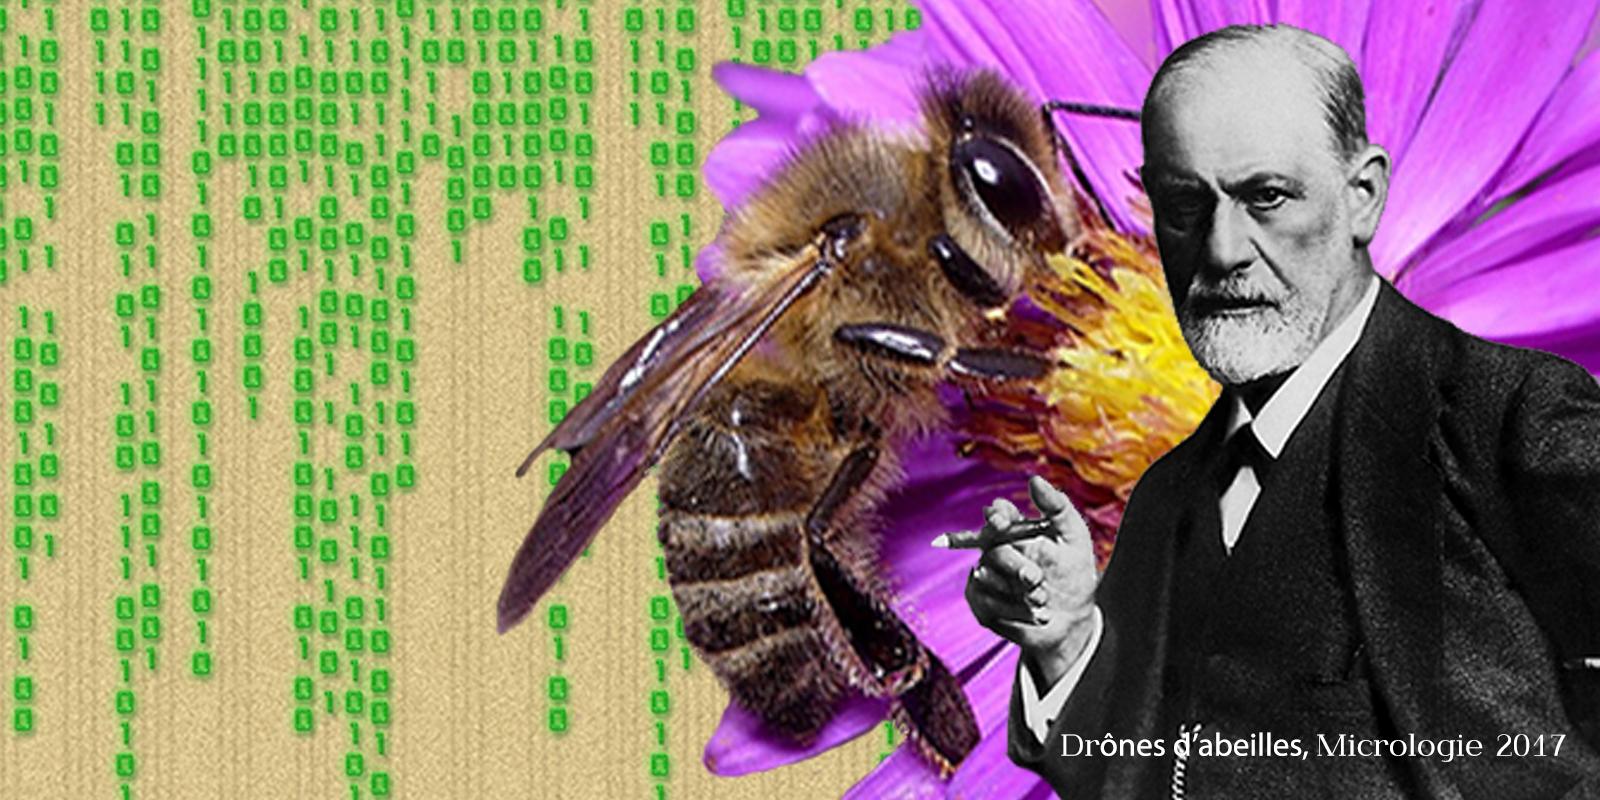 Drône d'abeilles, micrologie